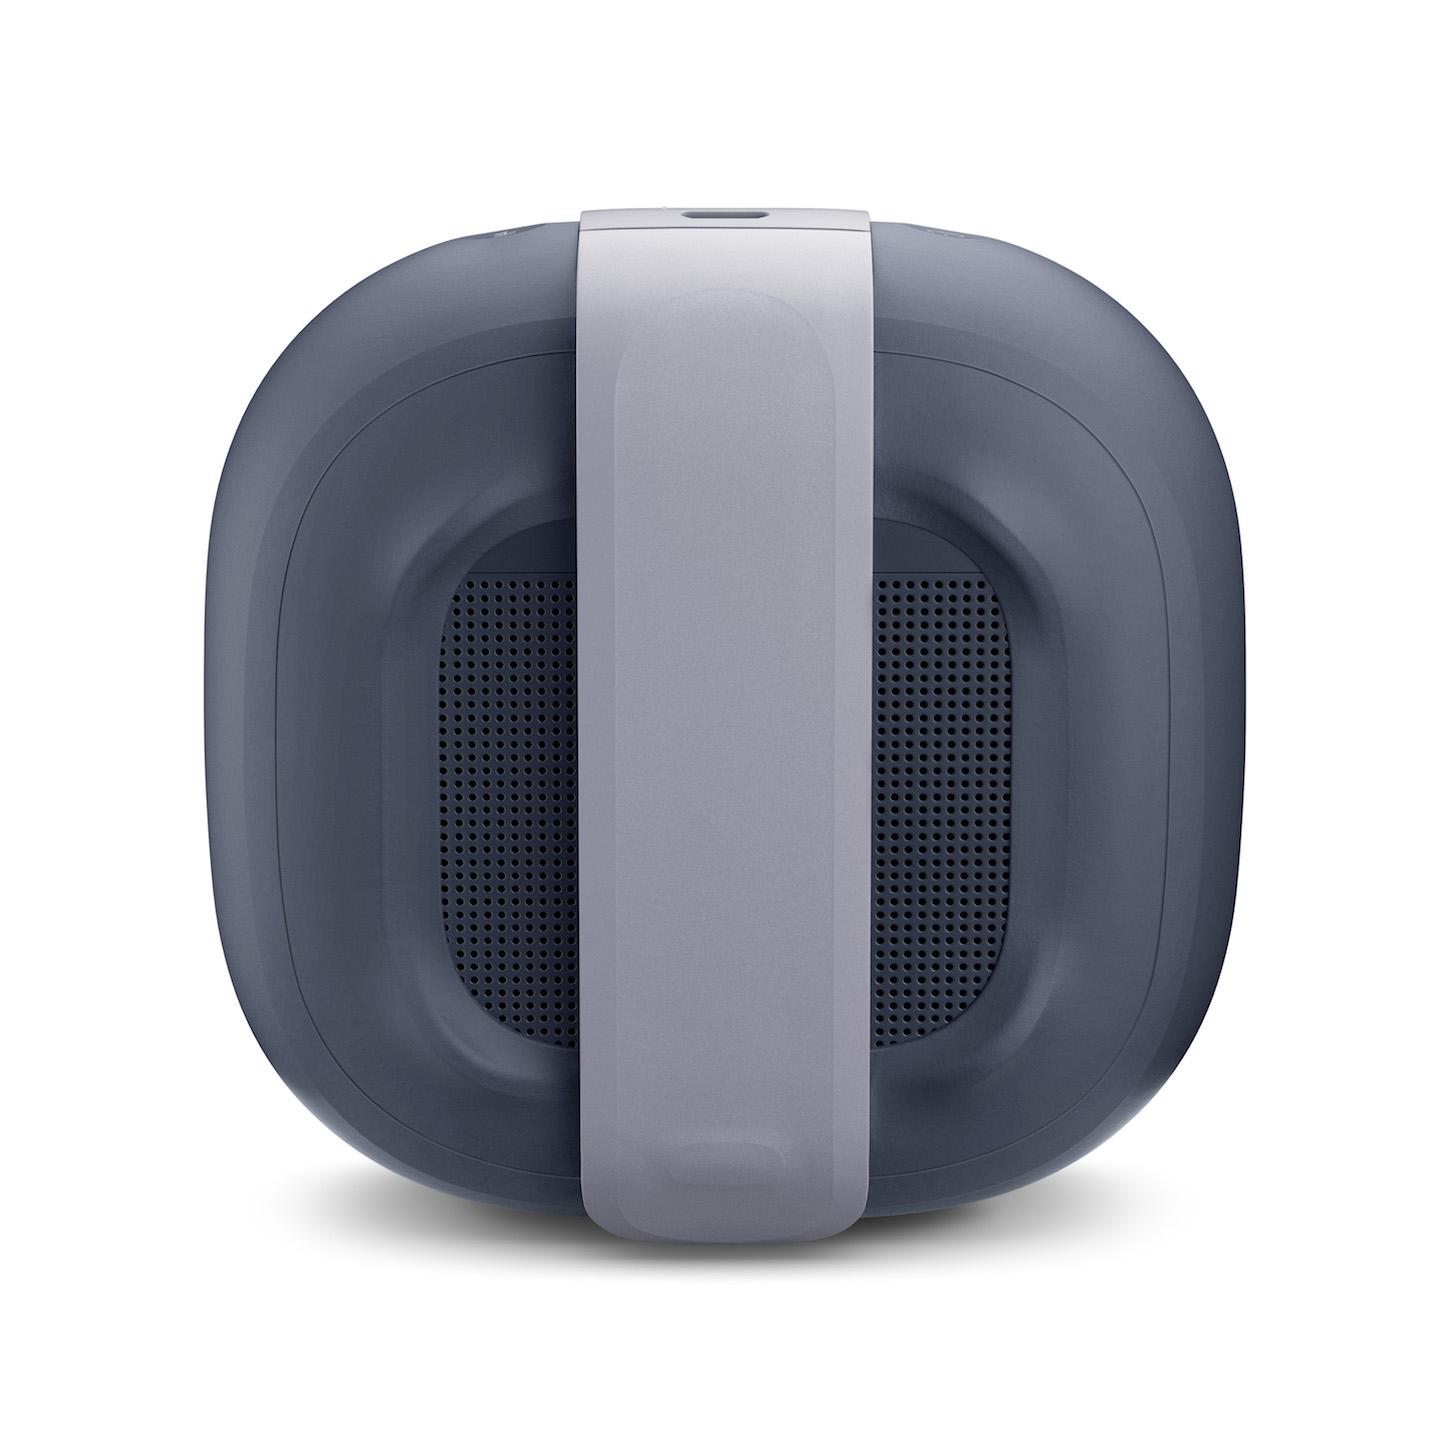 SoundLink-Micro-Bluetooth-Speaker_1854_4.jpg